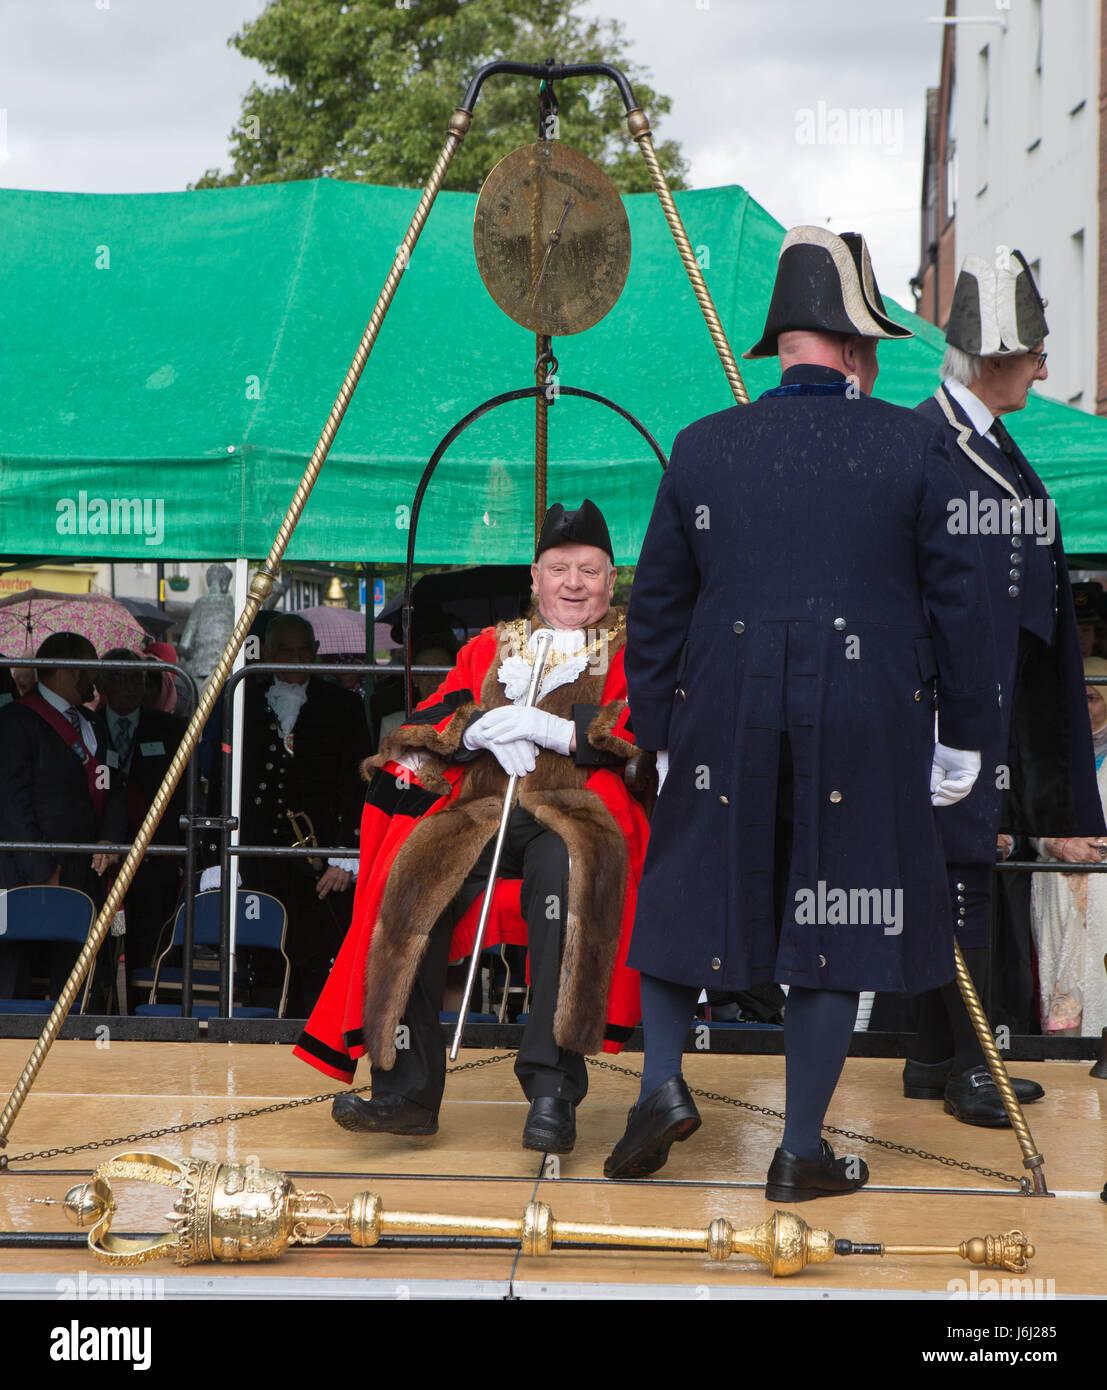 20 May 2017 The High Wycombe Mayor weighing ceremony High Wycombe Bucks UK the High Wycombe controversial new Mayor Stock Photo